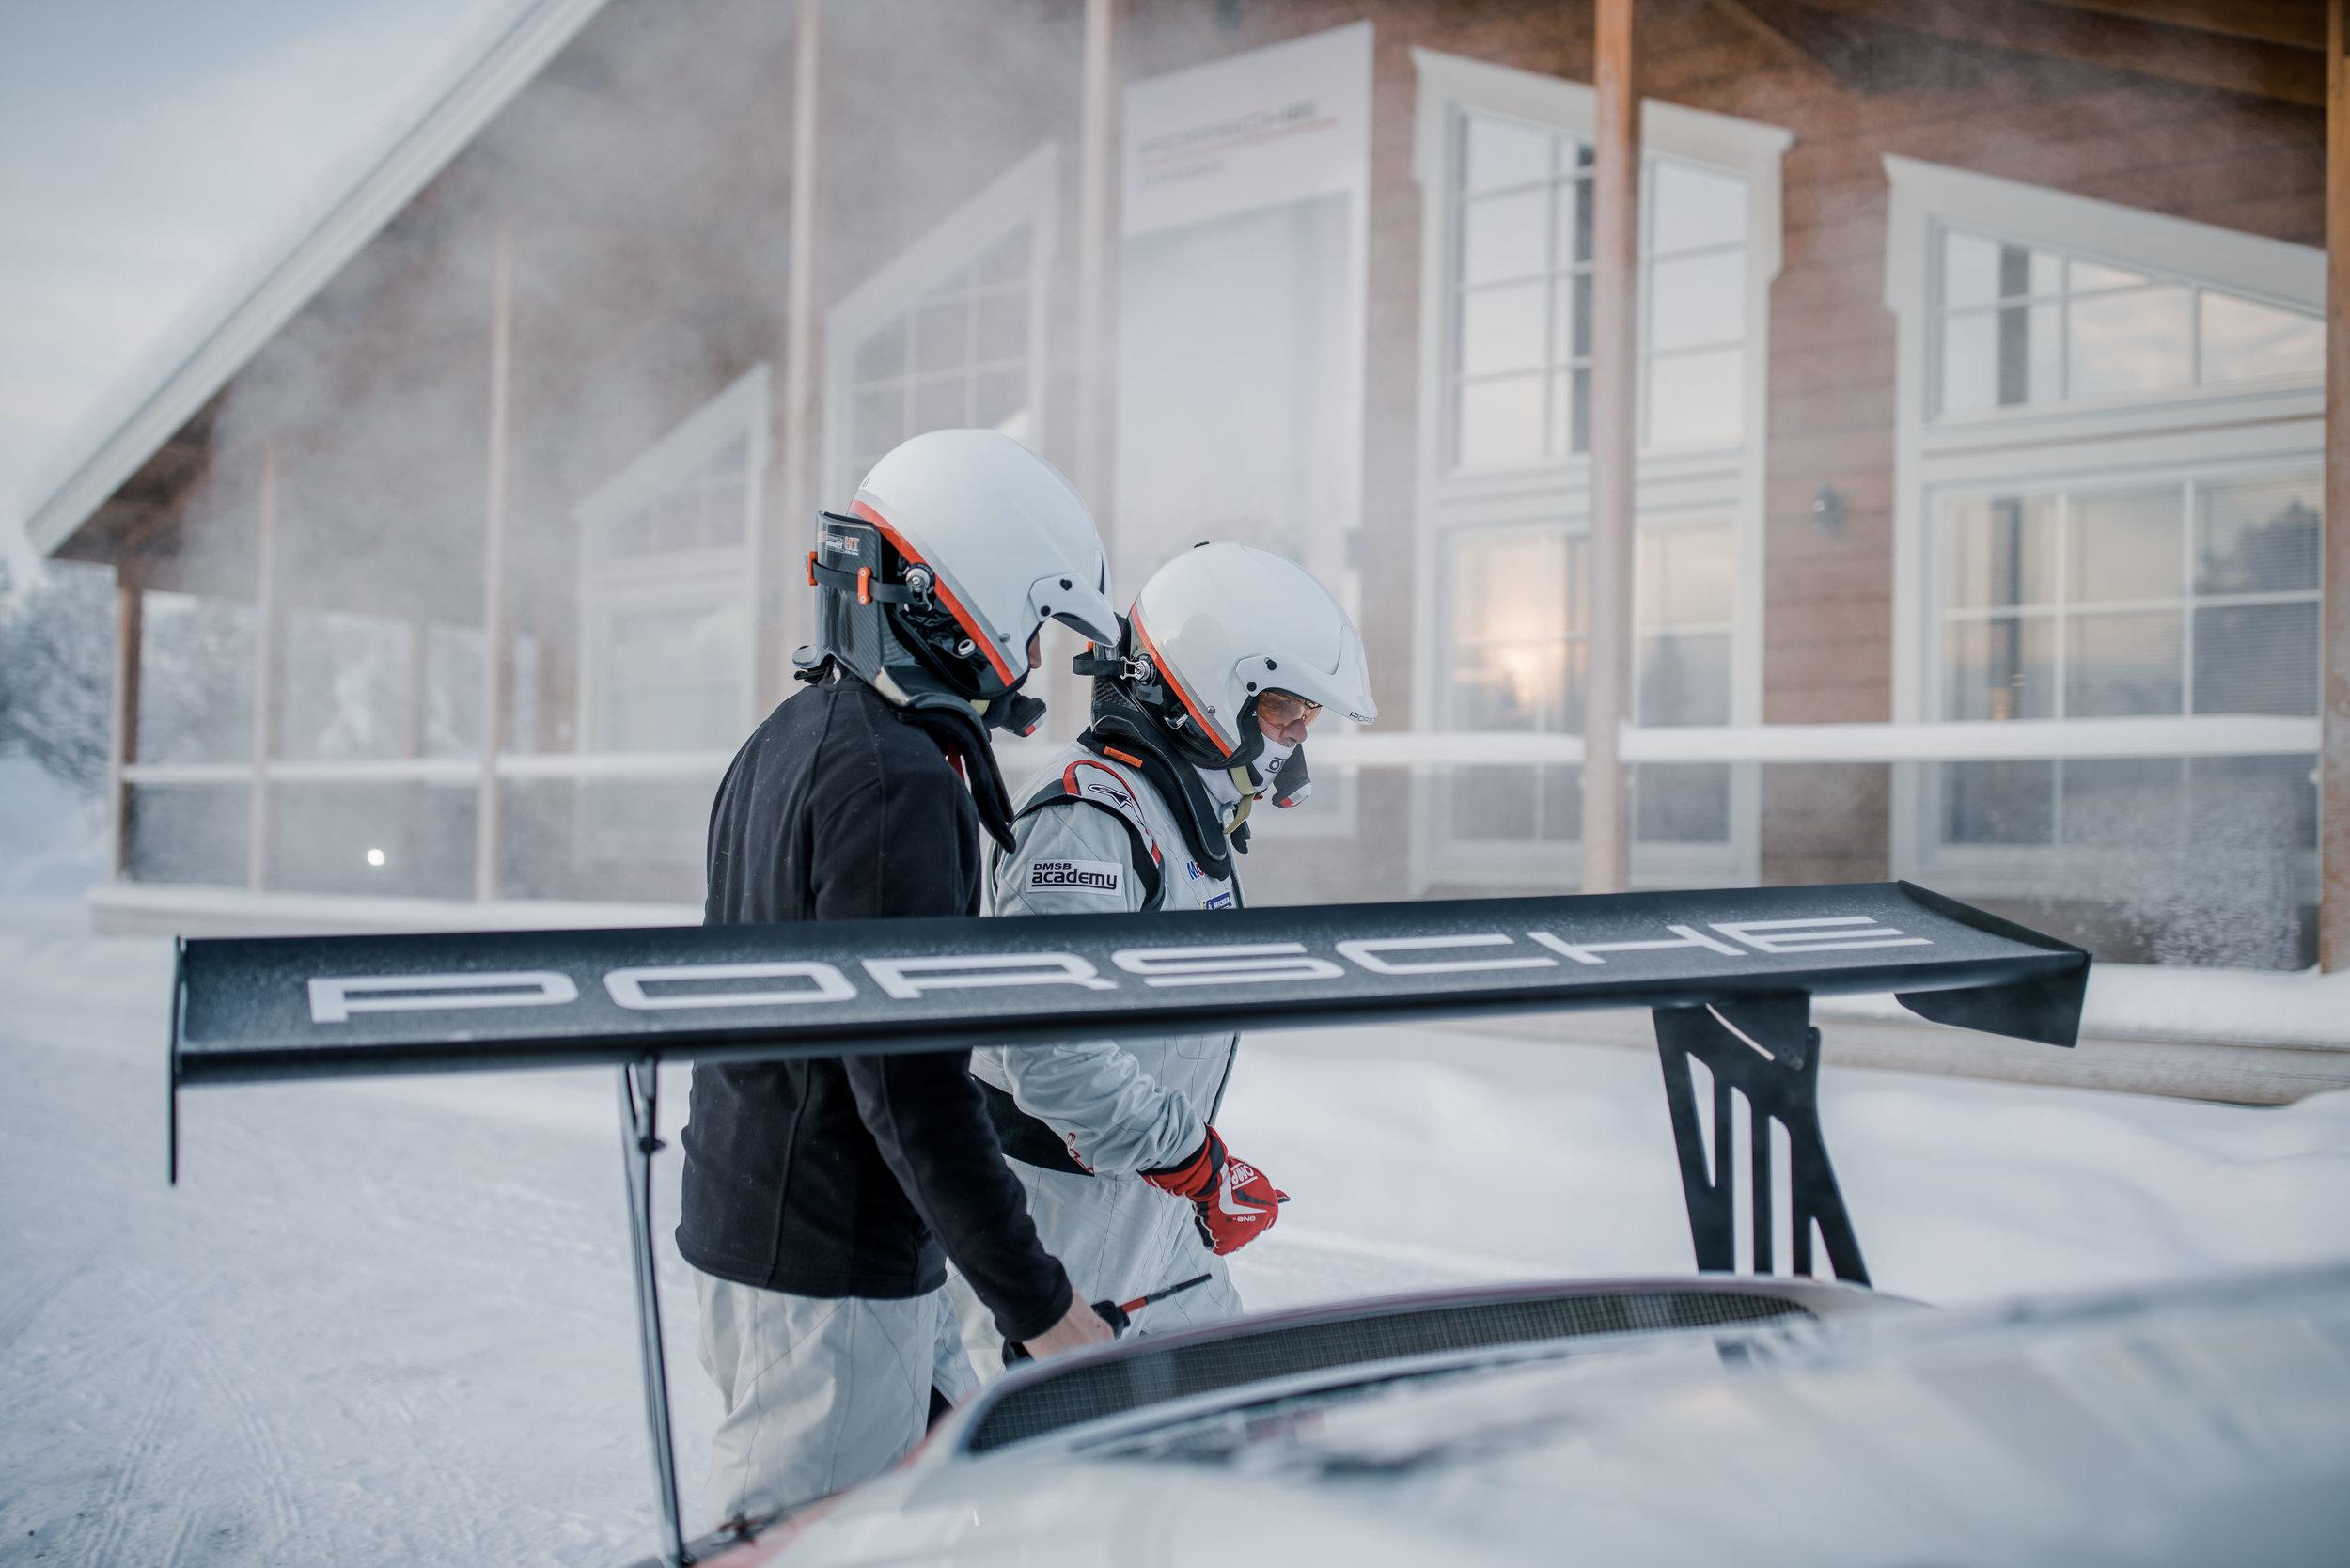 Porsche Ice Experience on Ice_30_01_2019_0937_175755.jpg